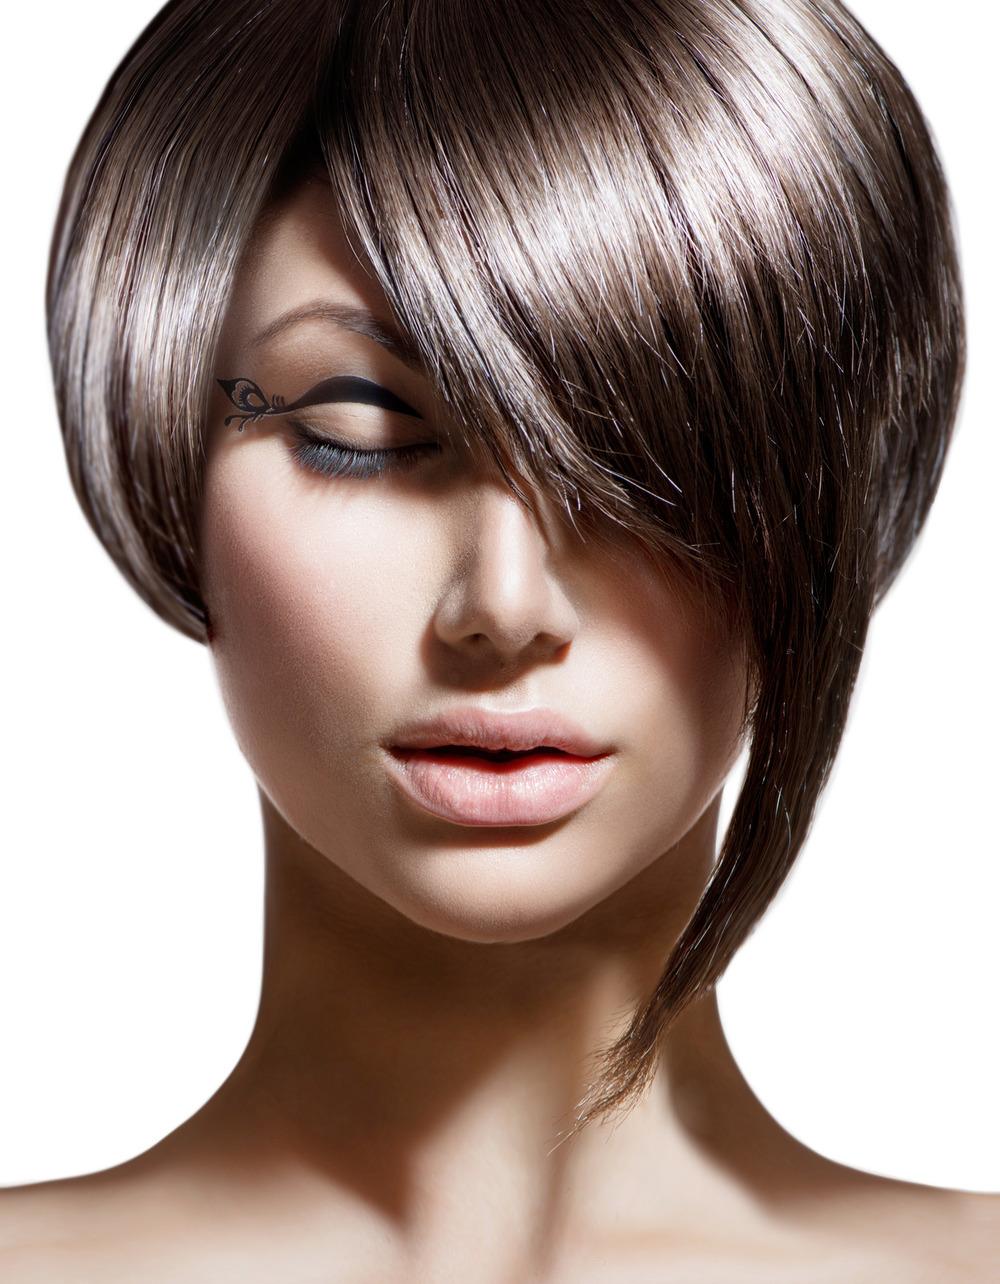 photodune-9923725-fashion-haircut-hairstyle-stylish-fringe-m.jpg